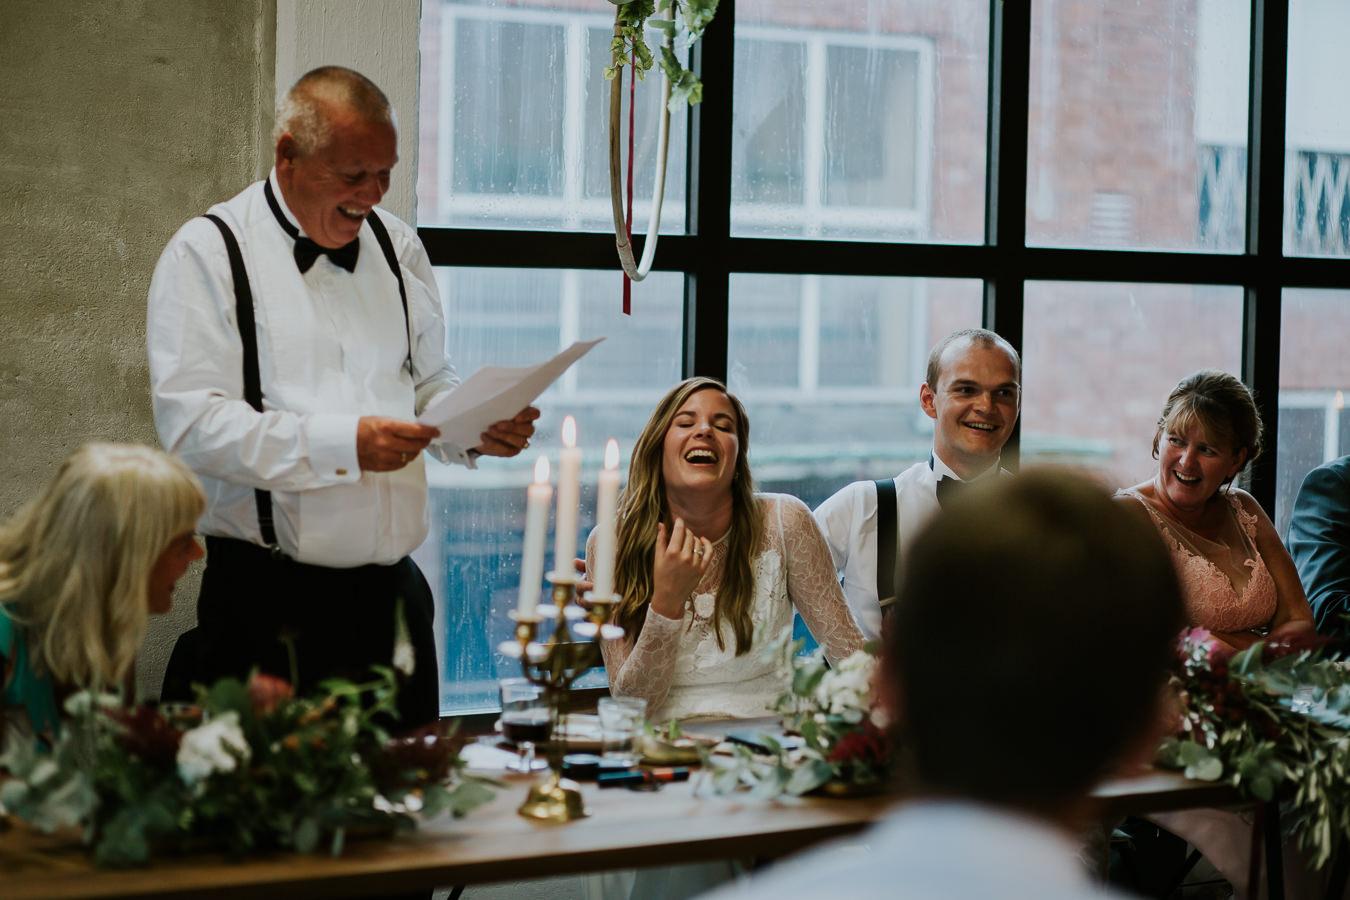 Bryllup-Lageret-Tofte-bryllupsfotograf-161.jpg